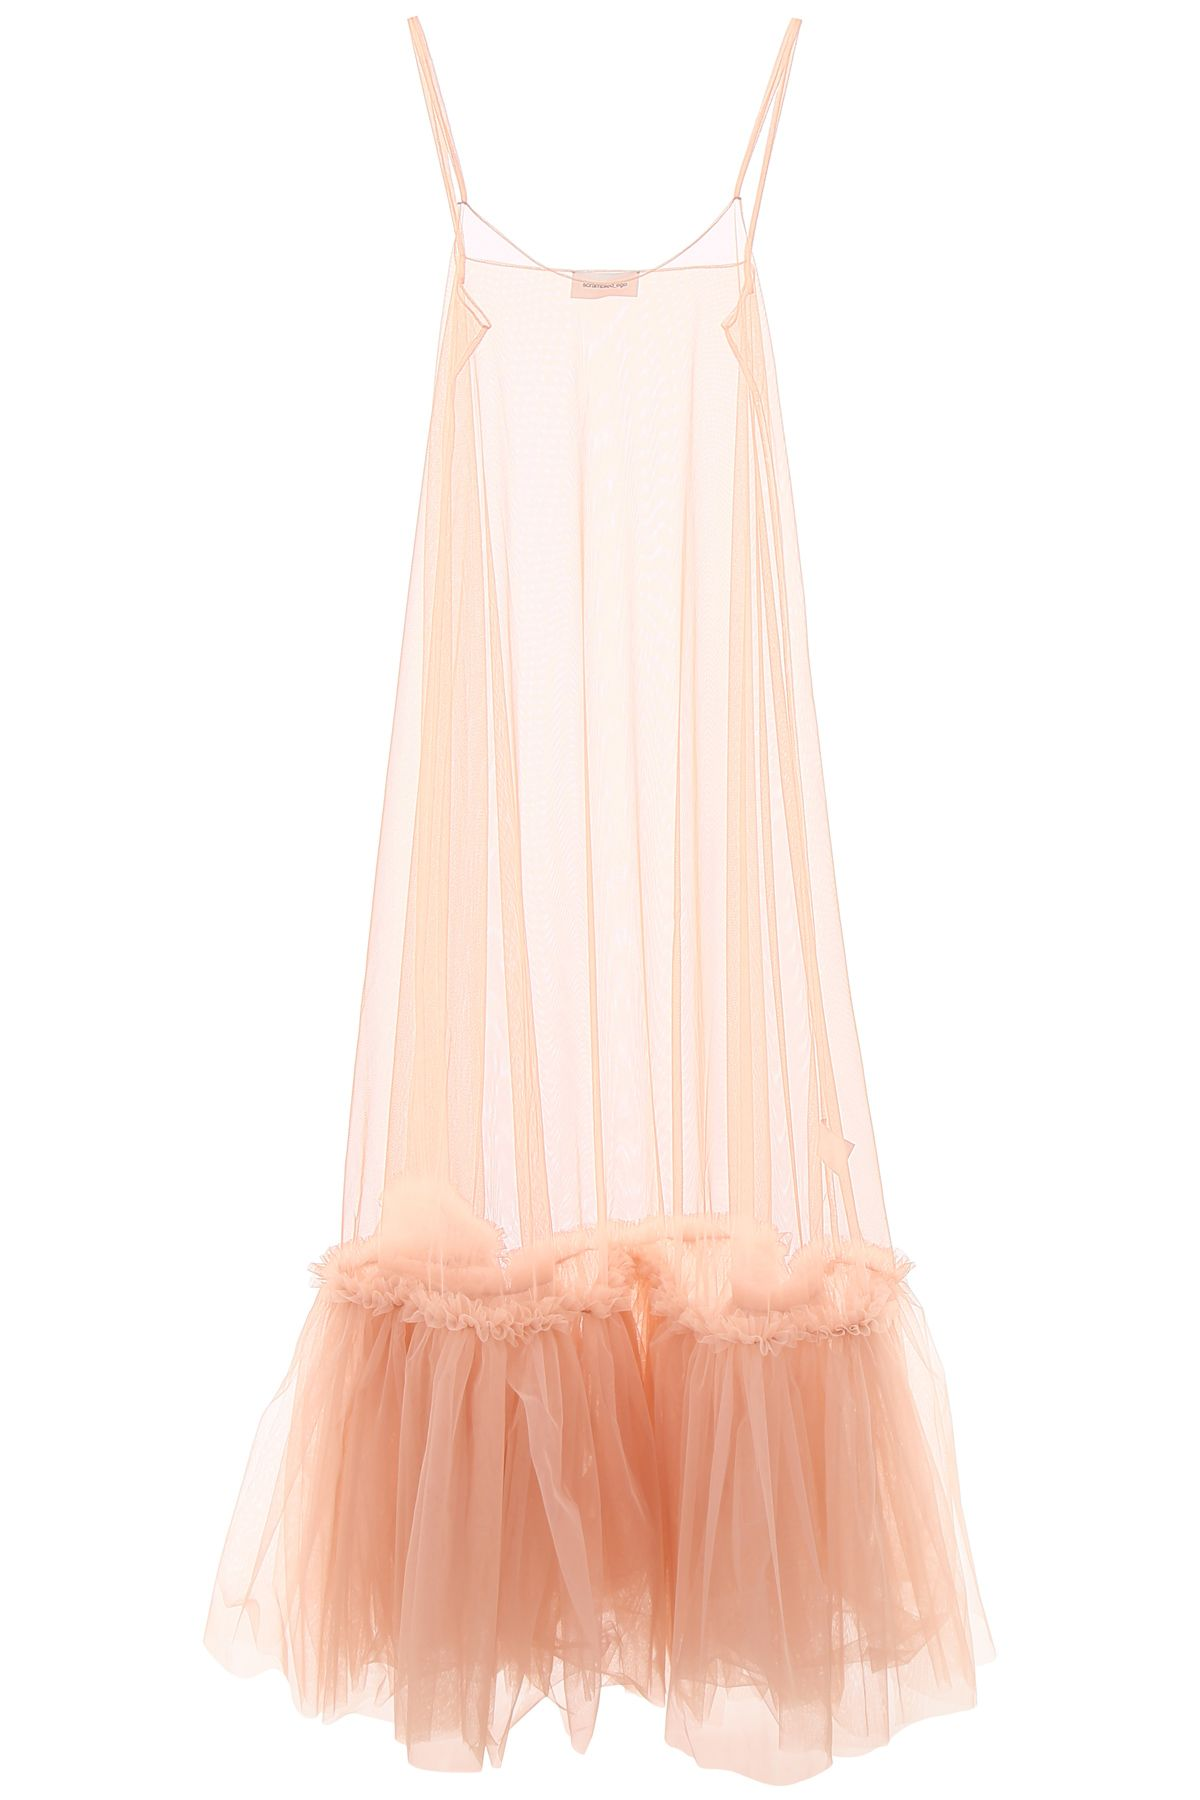 SCRAMBLED EGO Long Tulle Dress in Phard